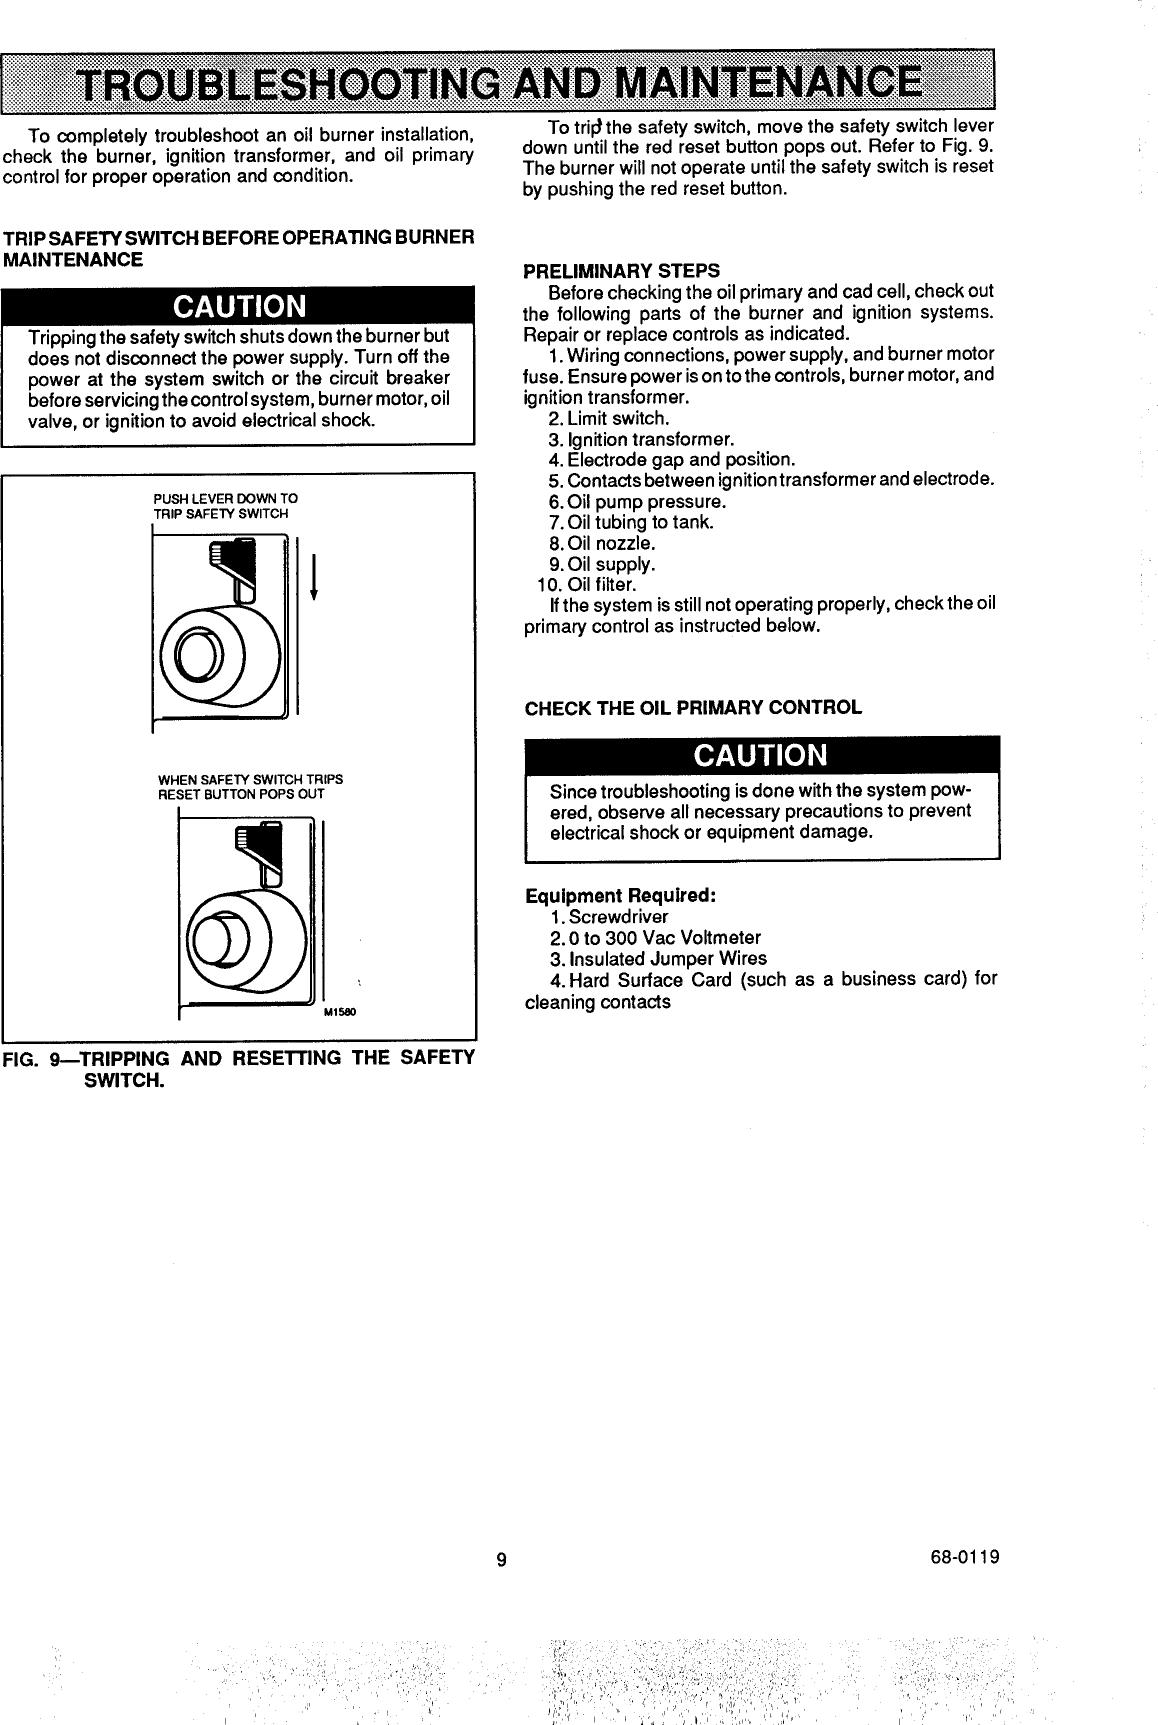 beckett oil burner wiring diagram power to light then switch reset parts